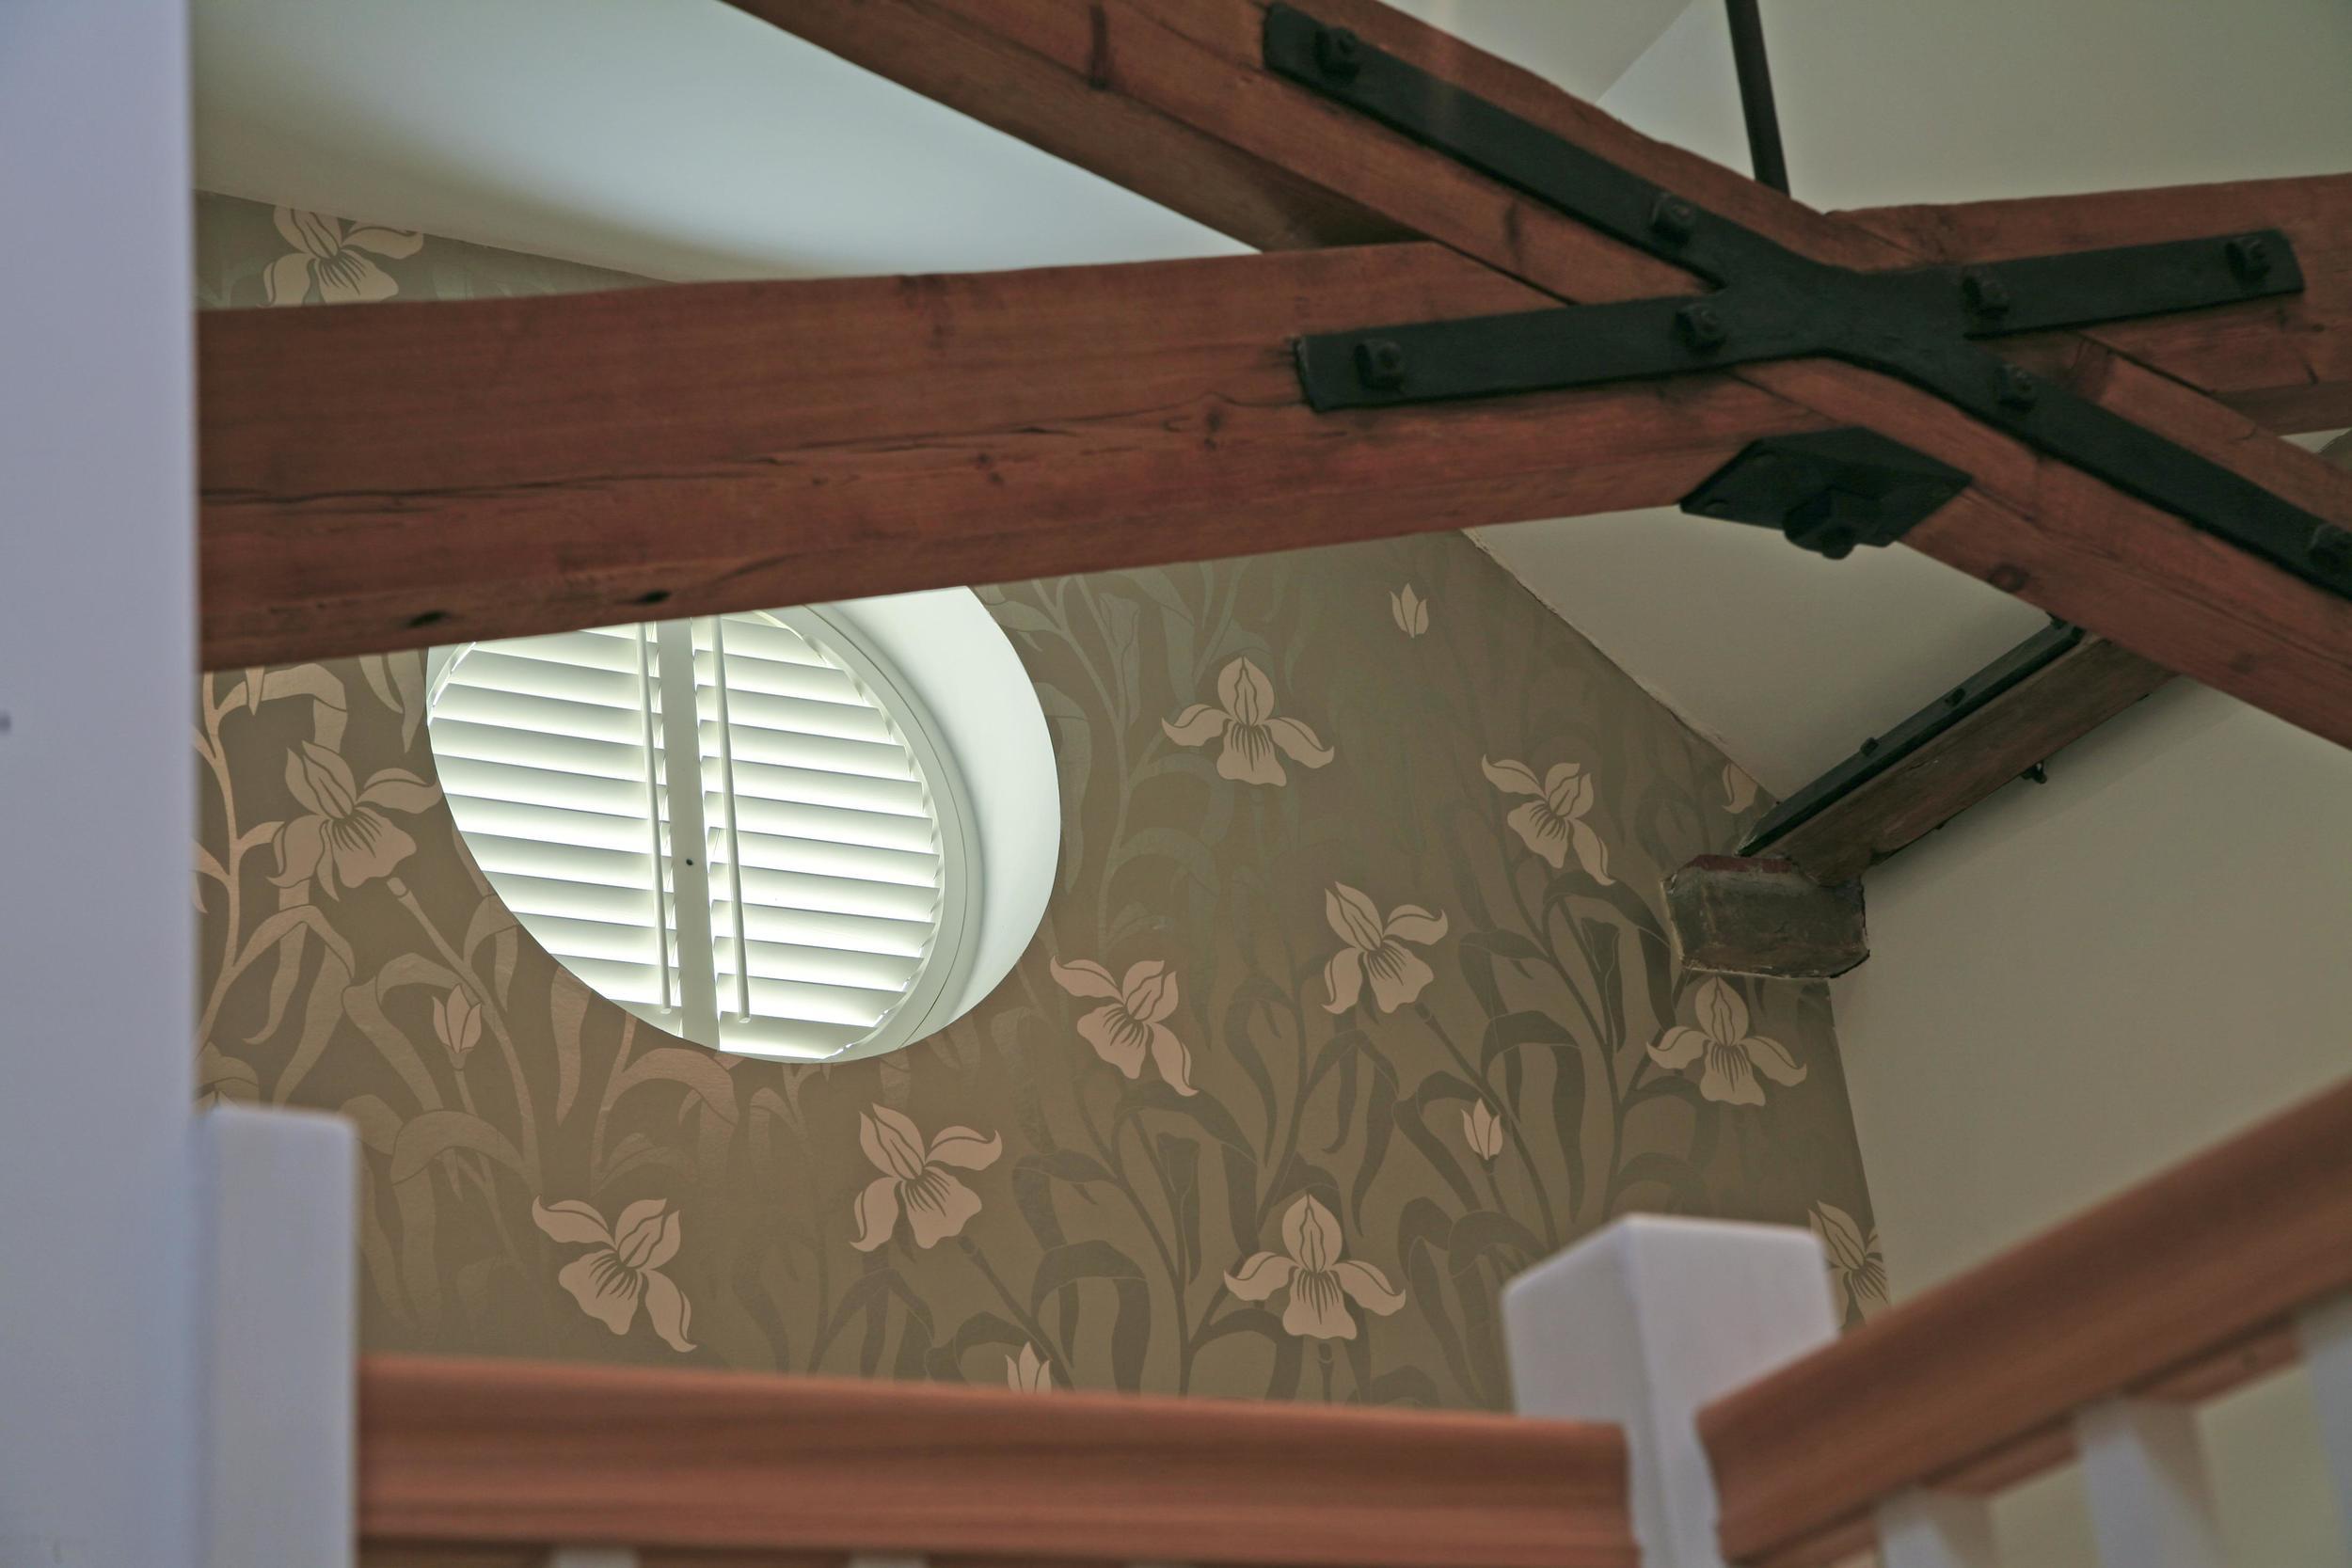 Wooden shutter on small window